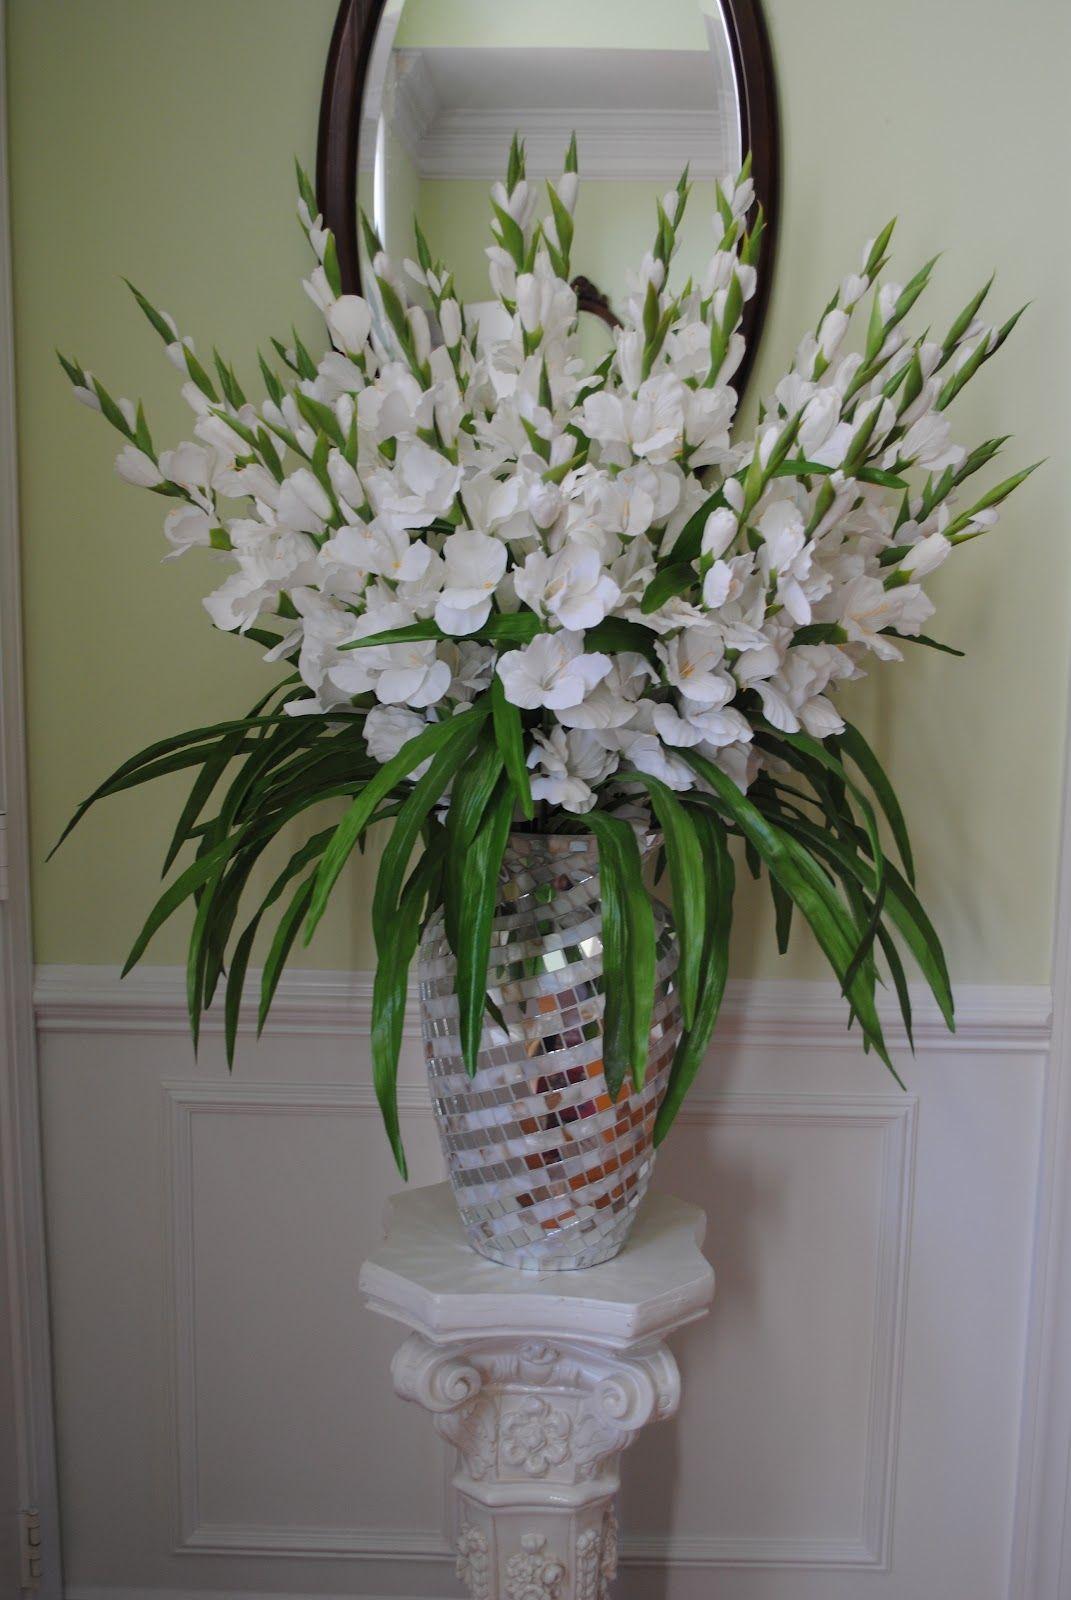 Holiday arrangements wholesale bulk flowers fiftyflowers - Flower Arrangements With Gladiolus Christmas Holiday Ideas Snow White Silk Gladiolus